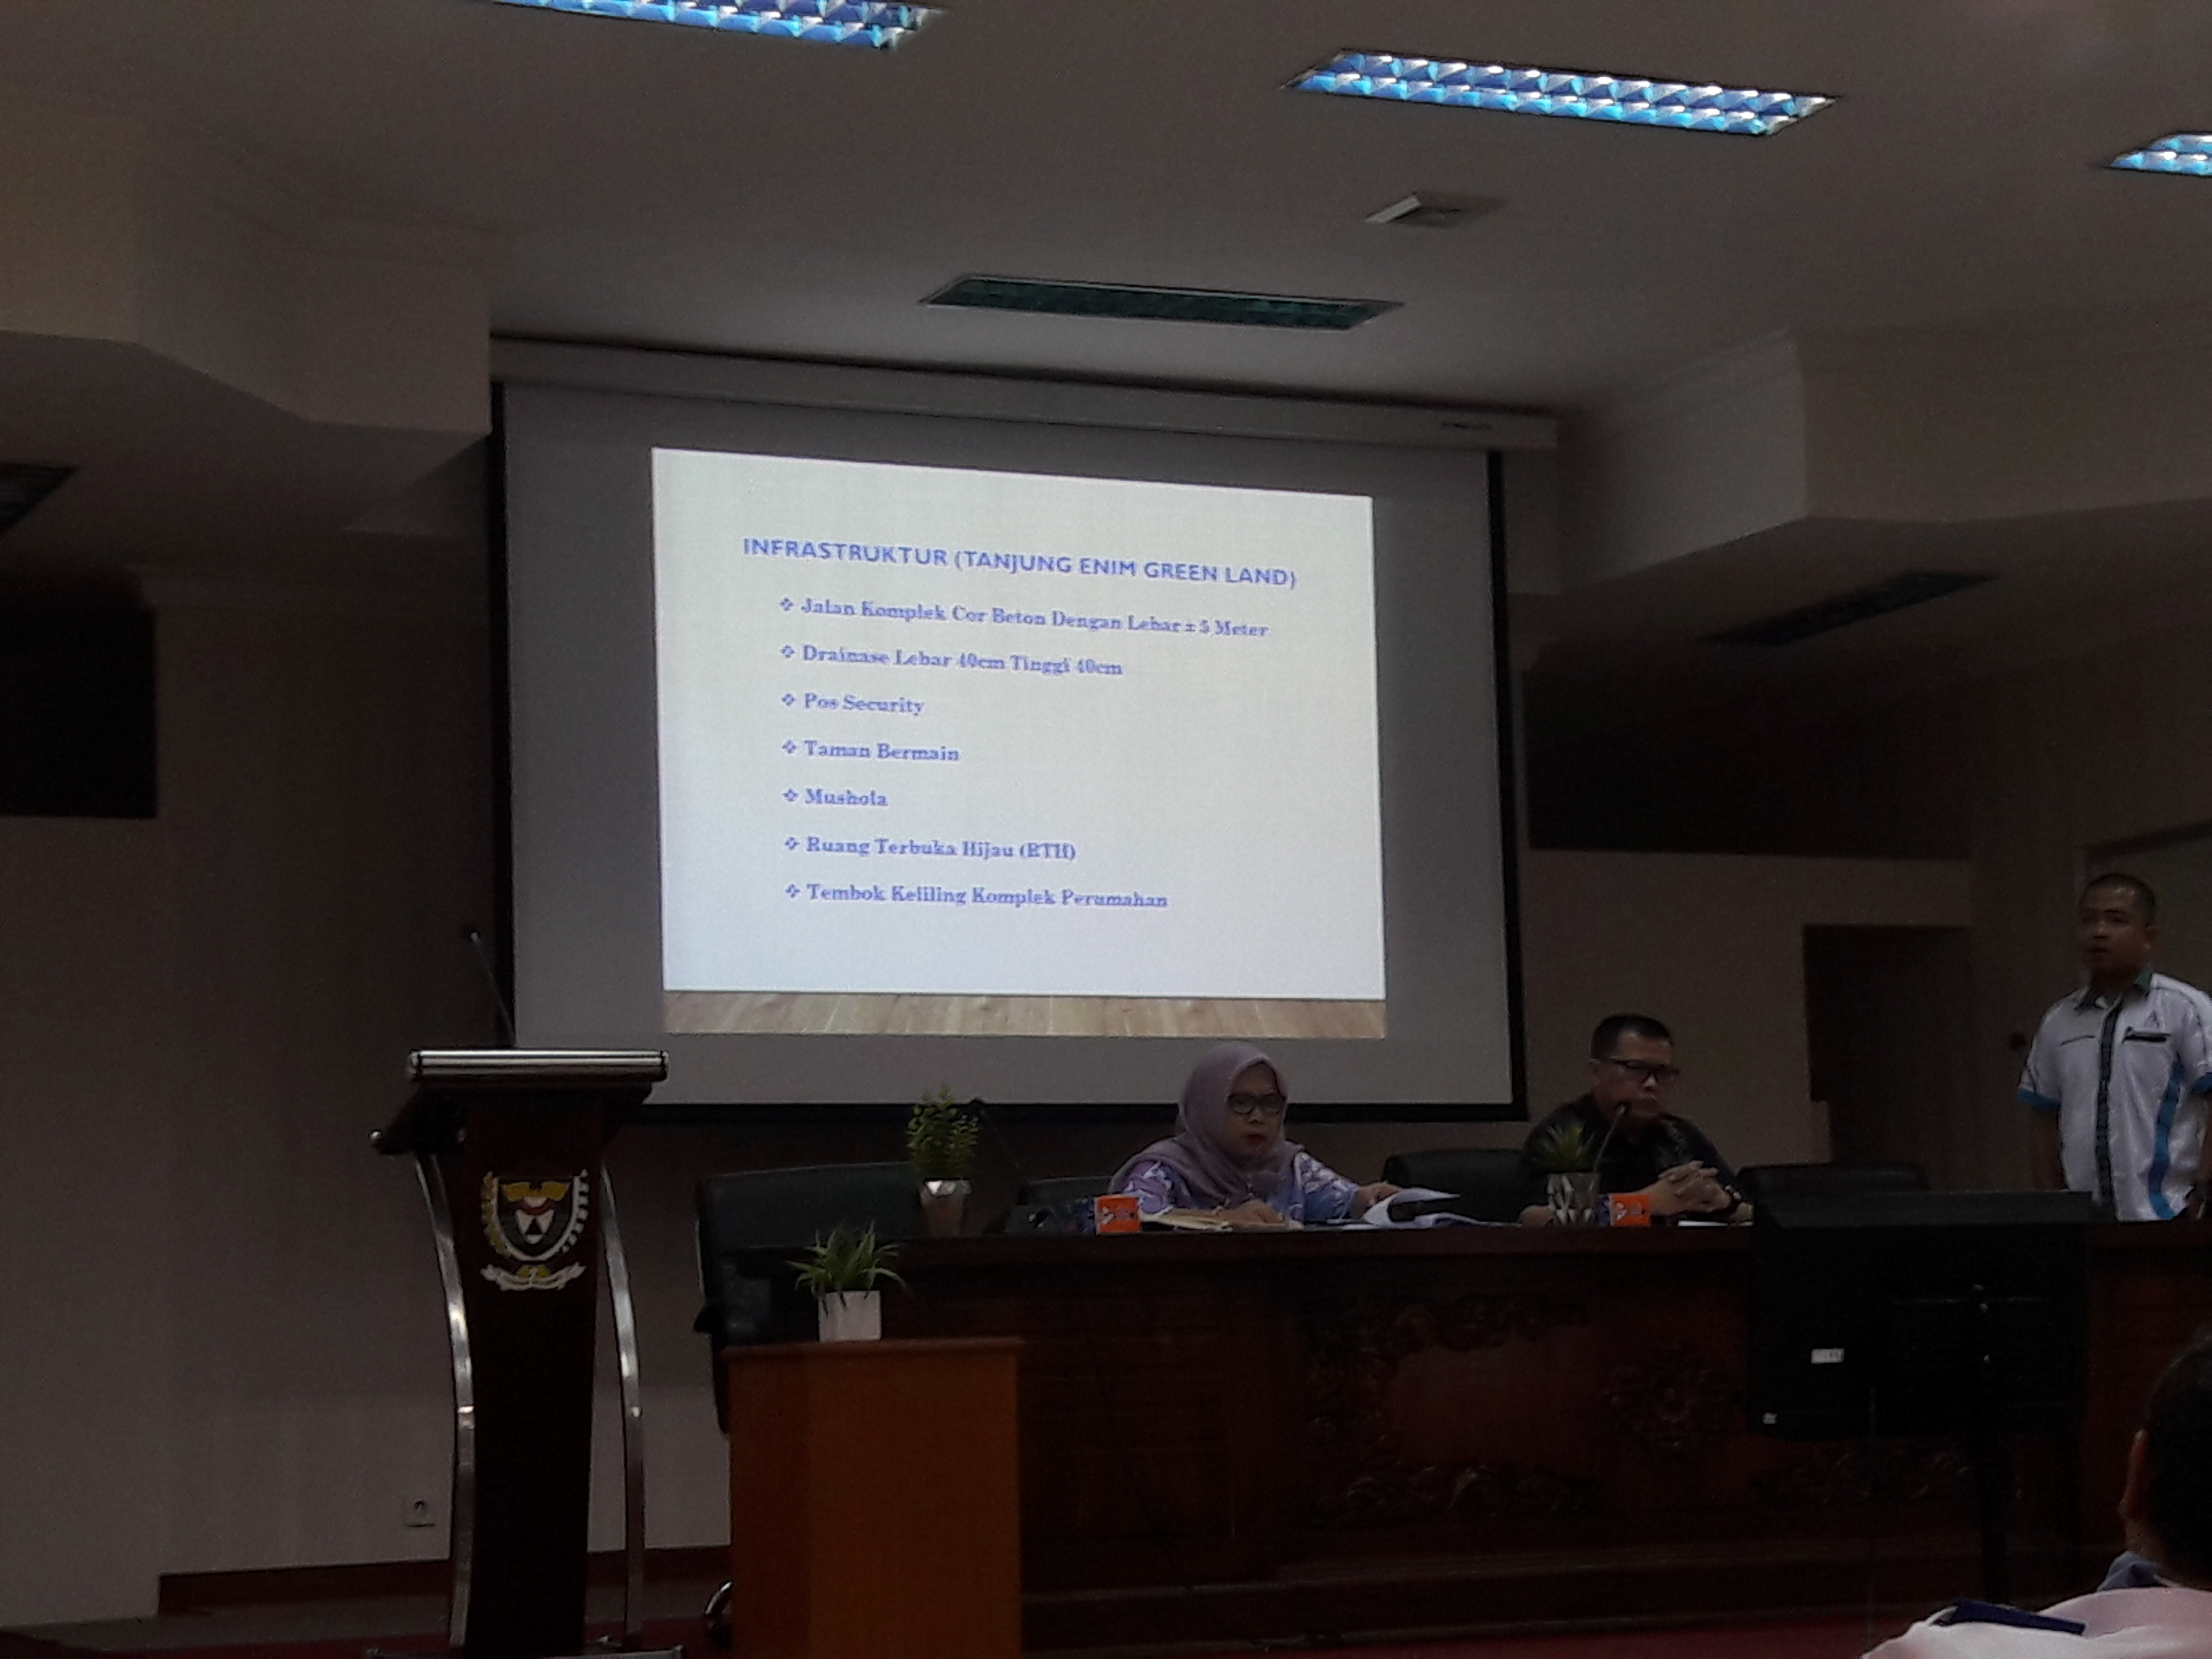 Pemkab Terima Proposal Tanjung Enim Green Land